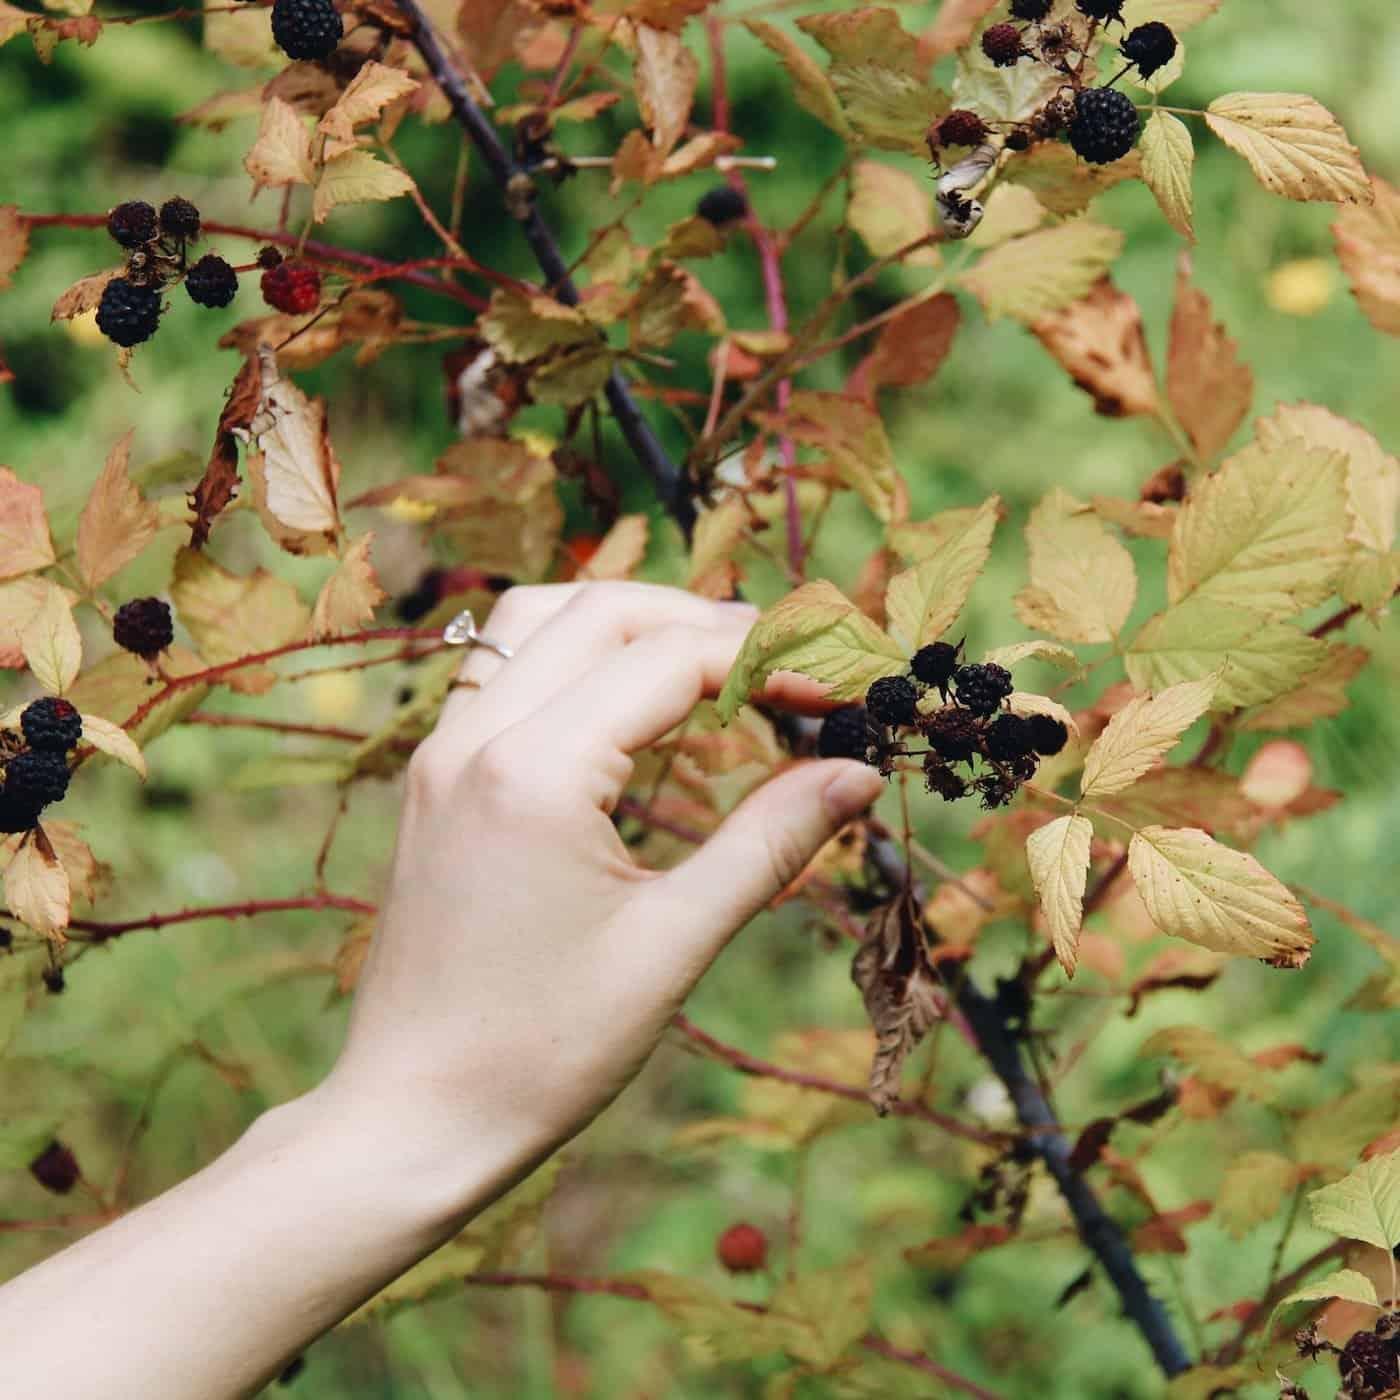 Hand harvesting berries in a permaculture garden